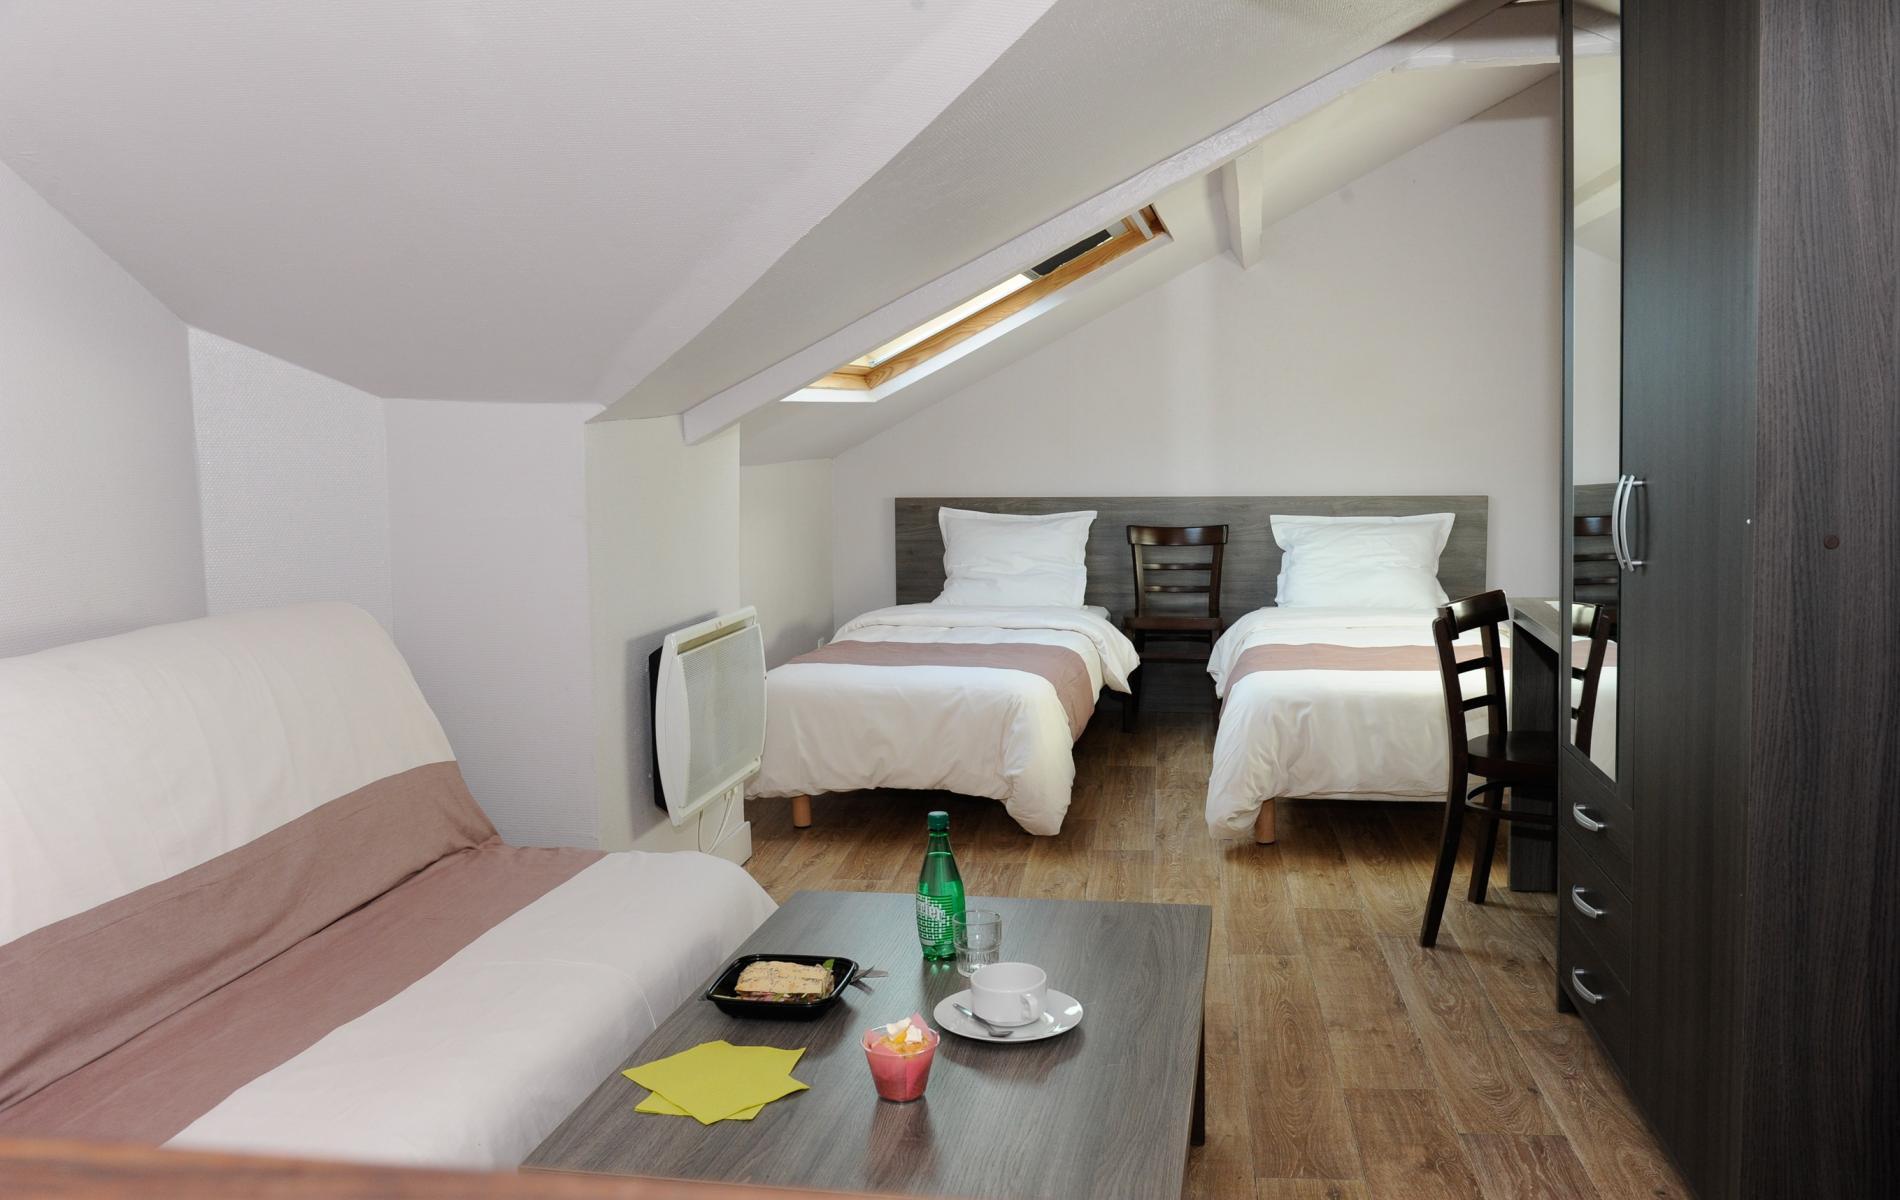 appartements hotel le havre appart hotel au havre. Black Bedroom Furniture Sets. Home Design Ideas